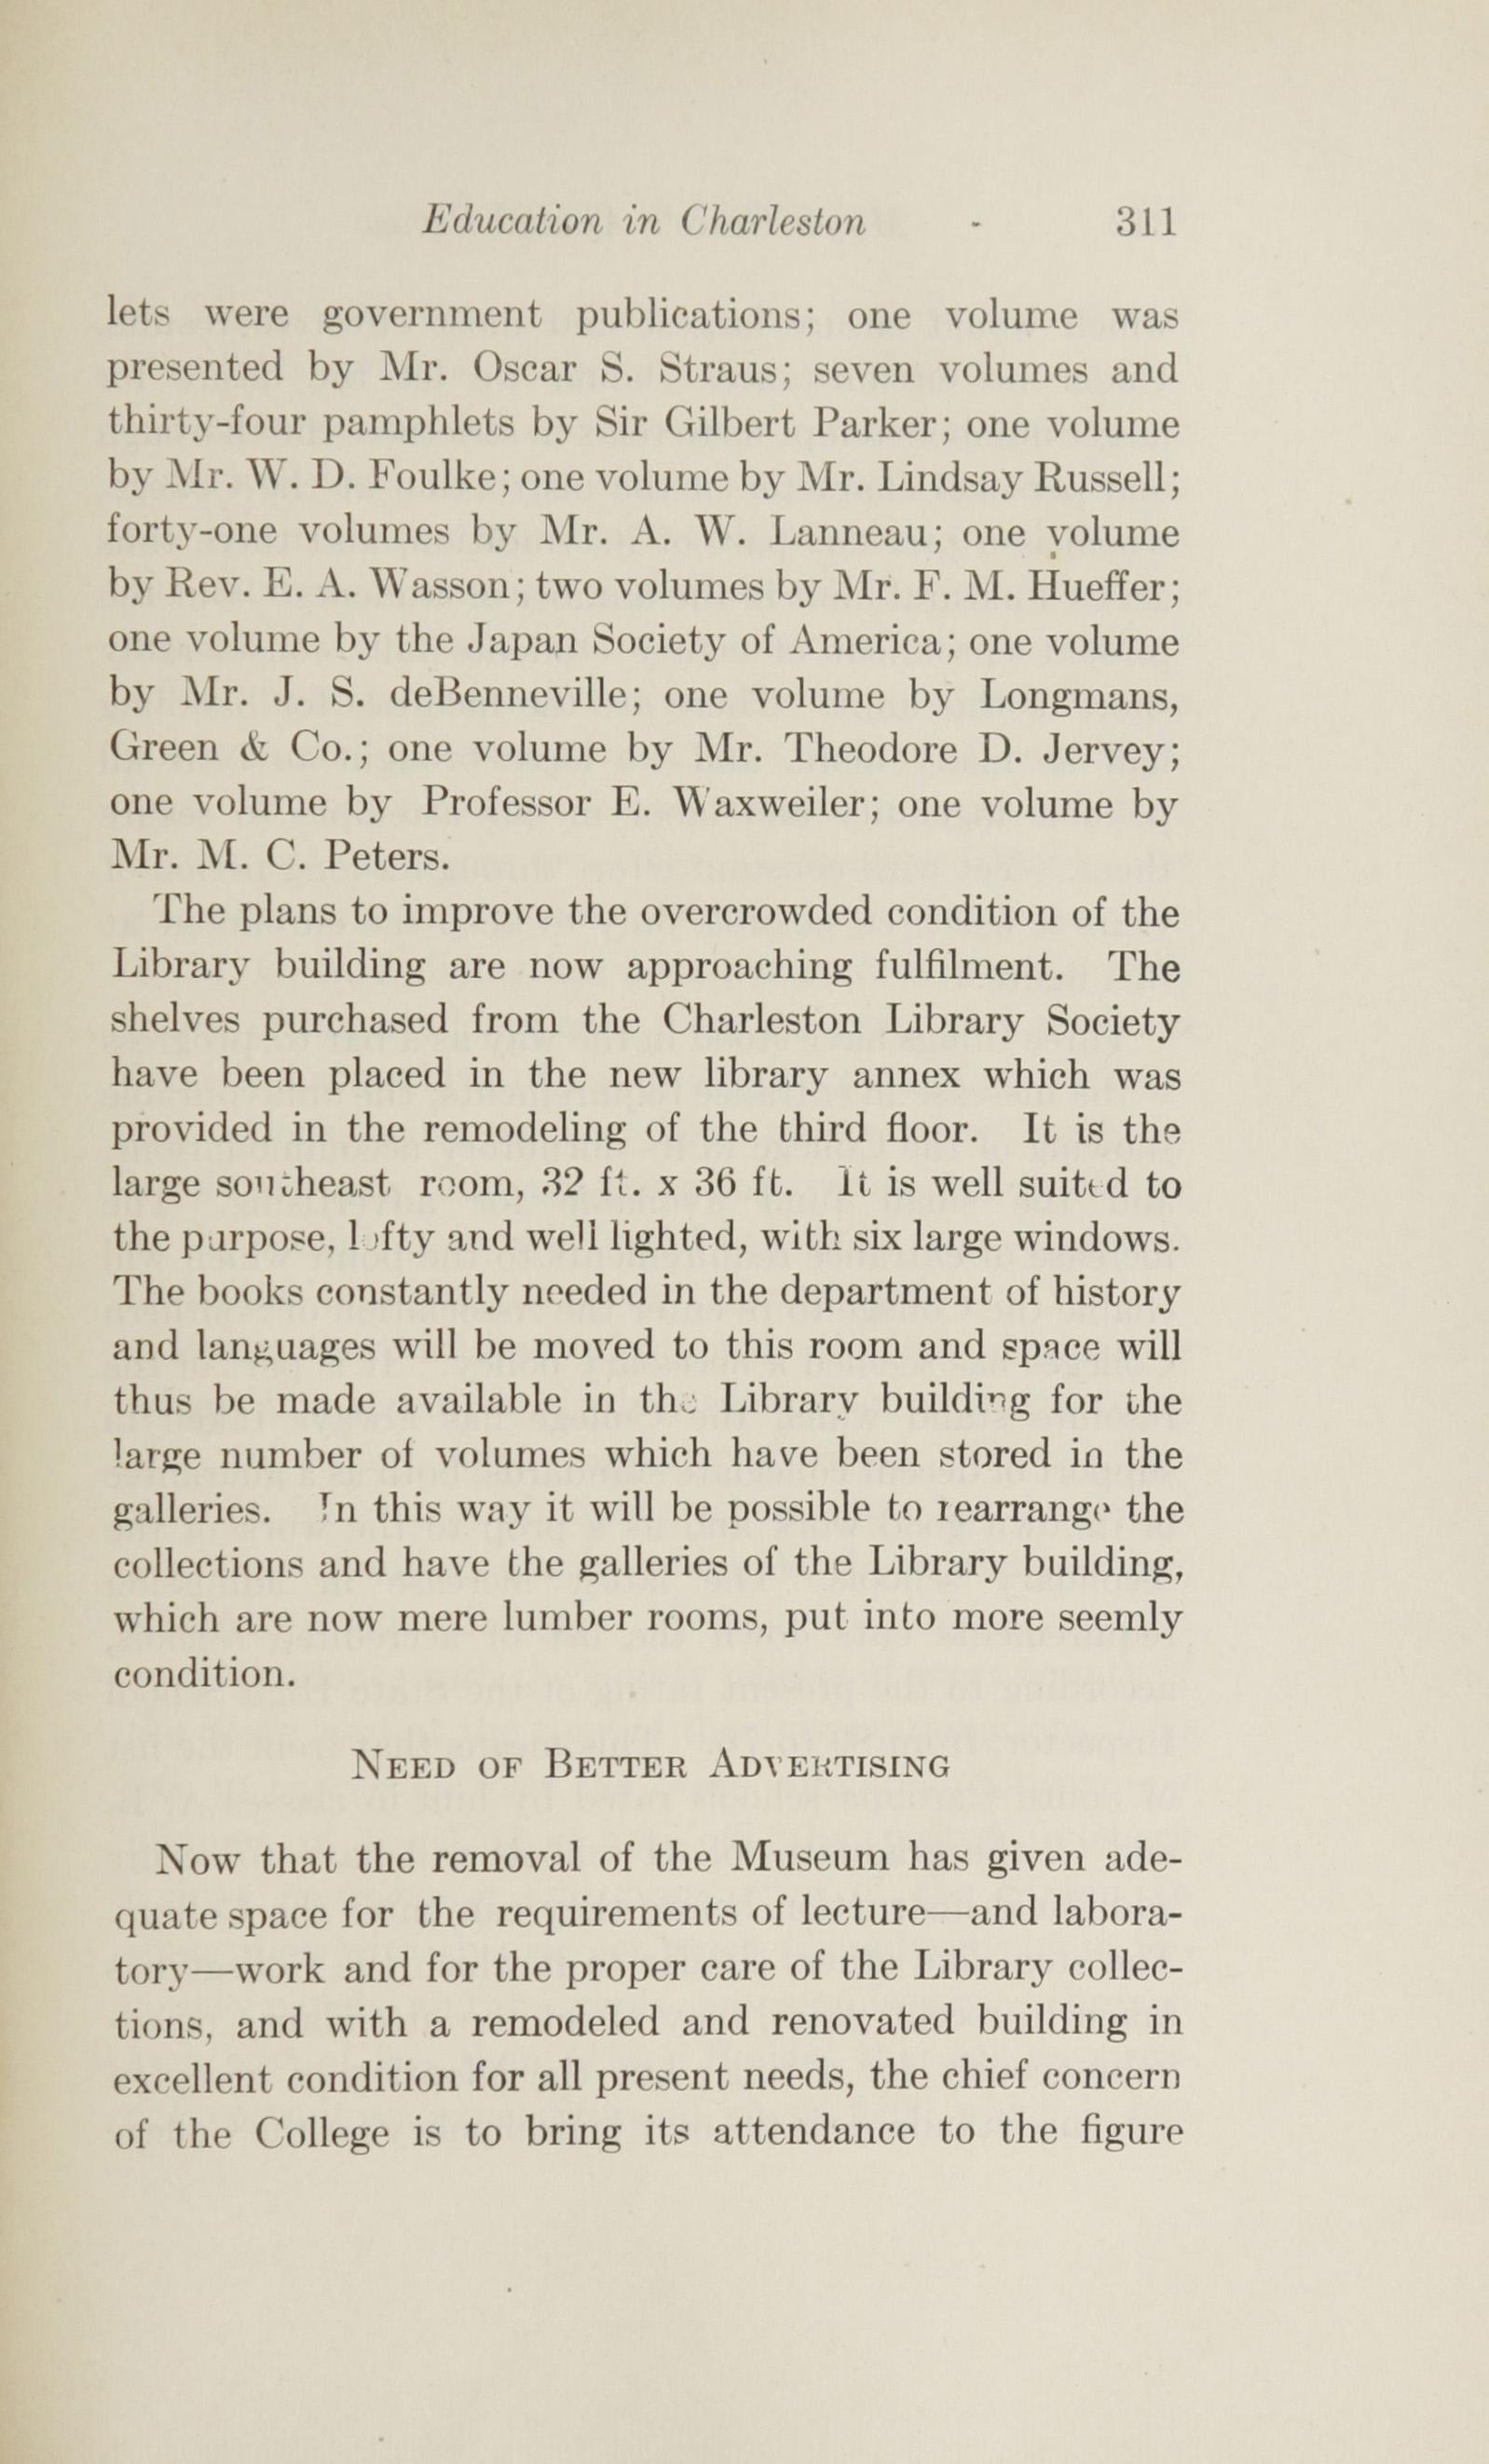 Charleston Yearbook, 1915, page 311